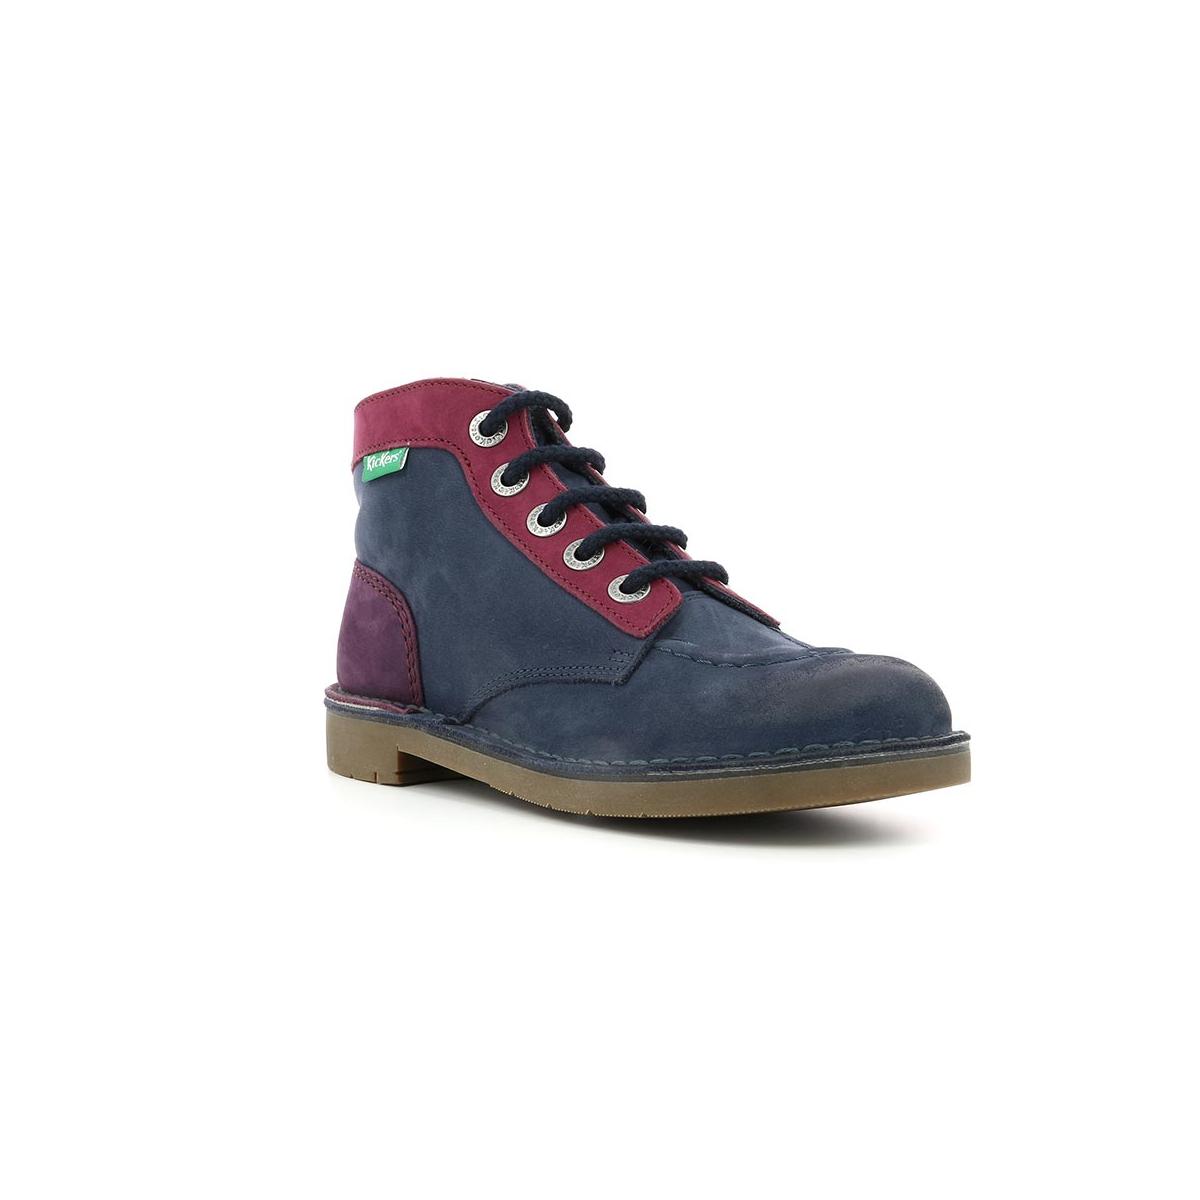 c71cefcd55d054 Kid's shoes KICK COL NAVY FUSHIA - Kickers